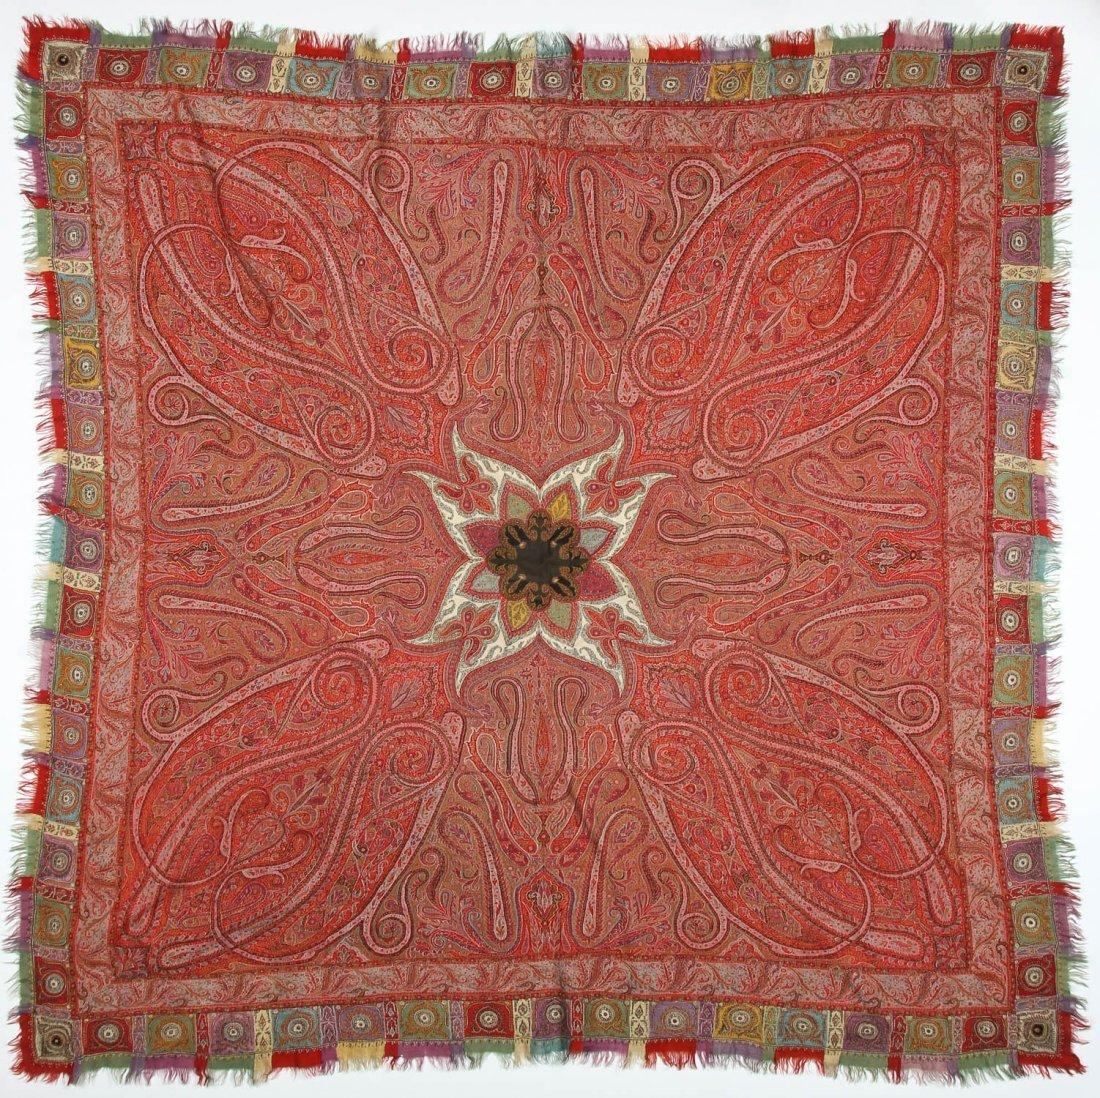 "Fine 19th c. Kashmir Shawl, India: 78"" x 80"" (198 x 203"